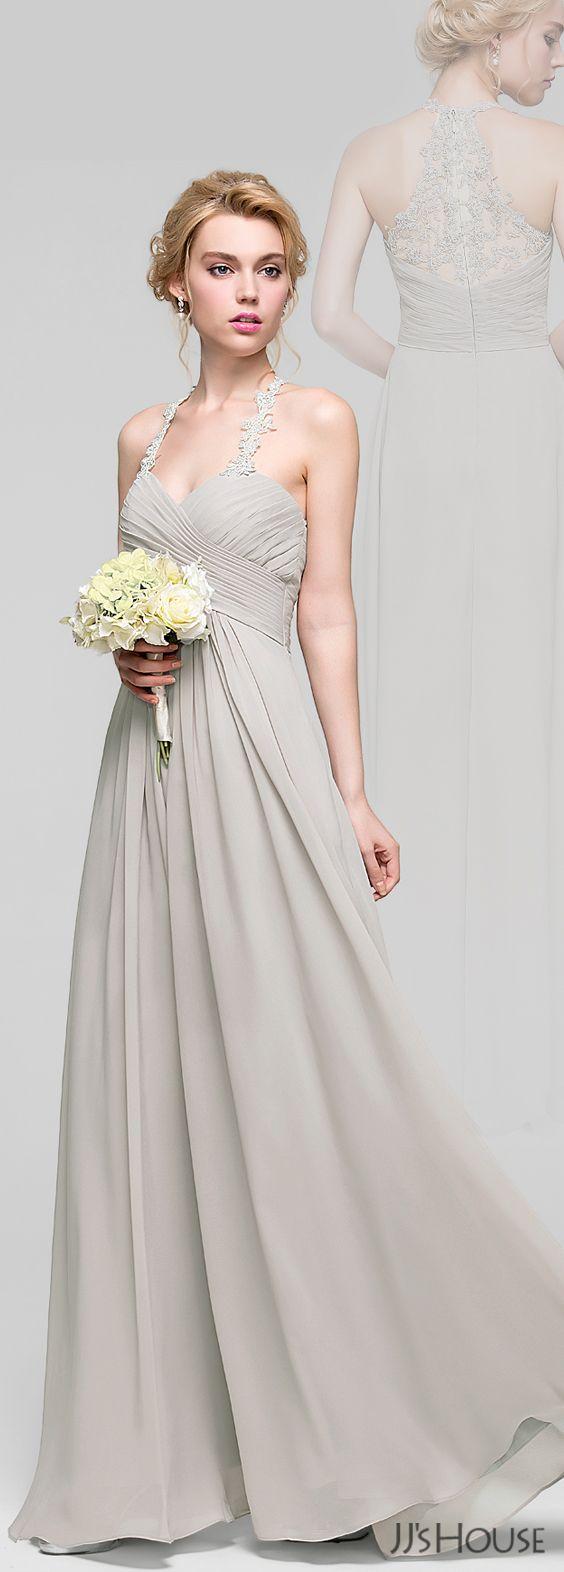 best princess weddingsgatheringsevents images on pinterest